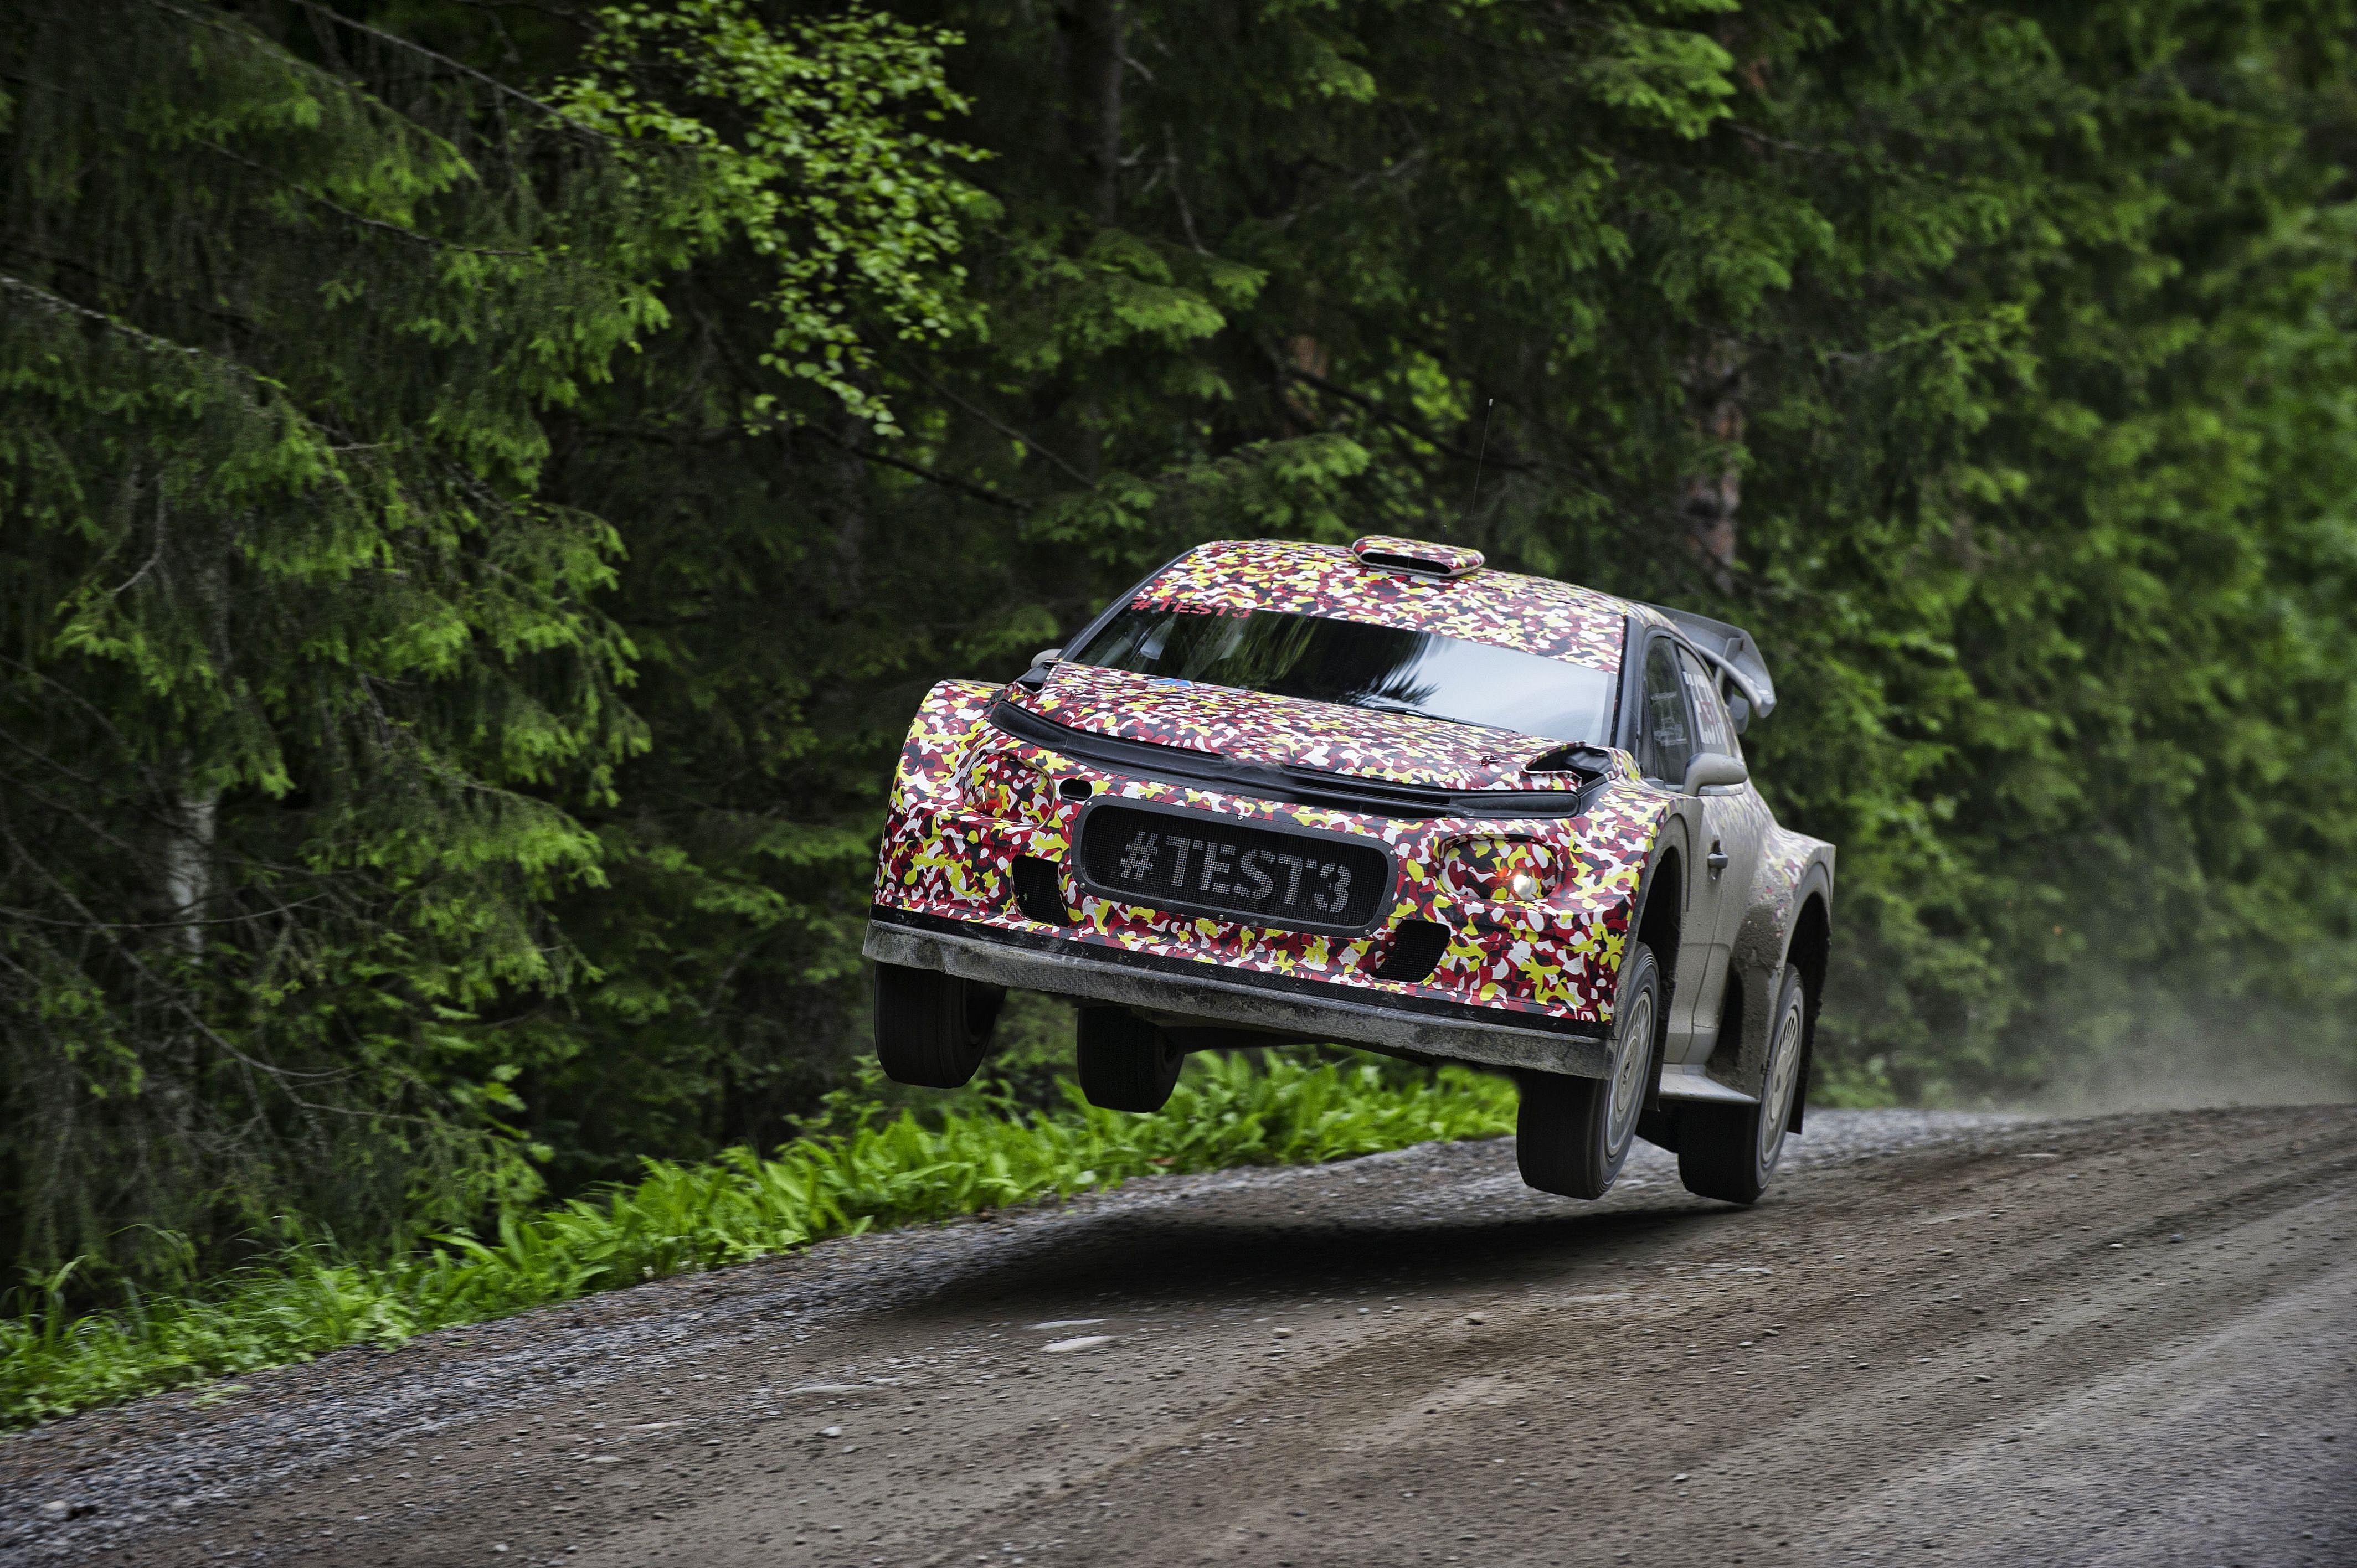 Wrc Citroen Completes 2017 World Rally Car Aero Test